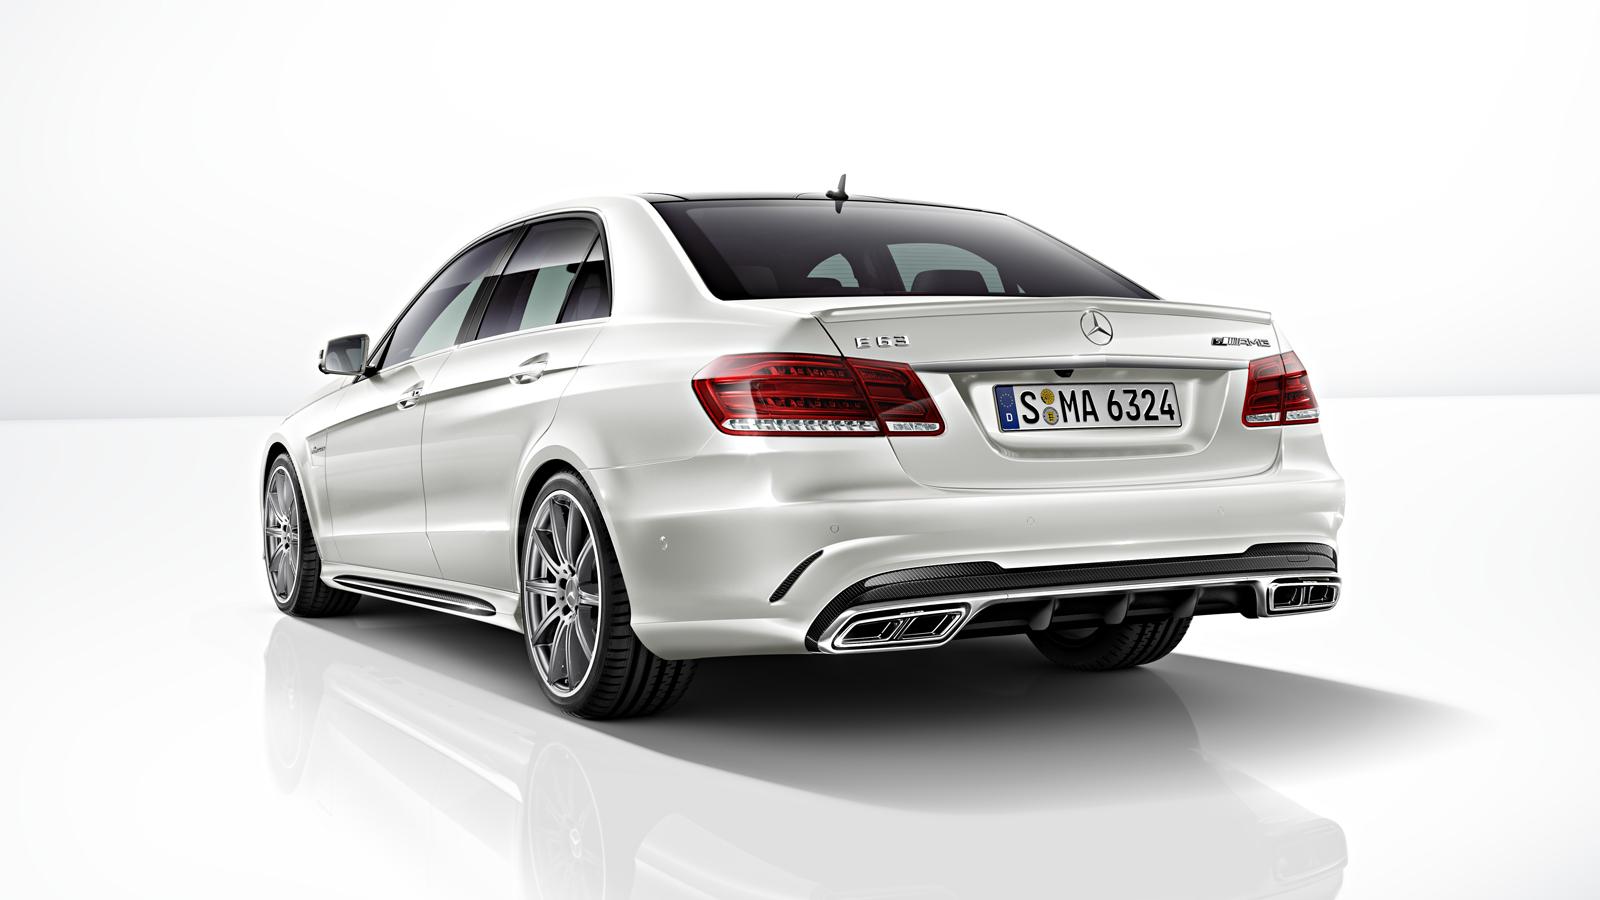 Spawnzon blog 2013 mercedes benz e63 amg s model for Mercedes benz s models